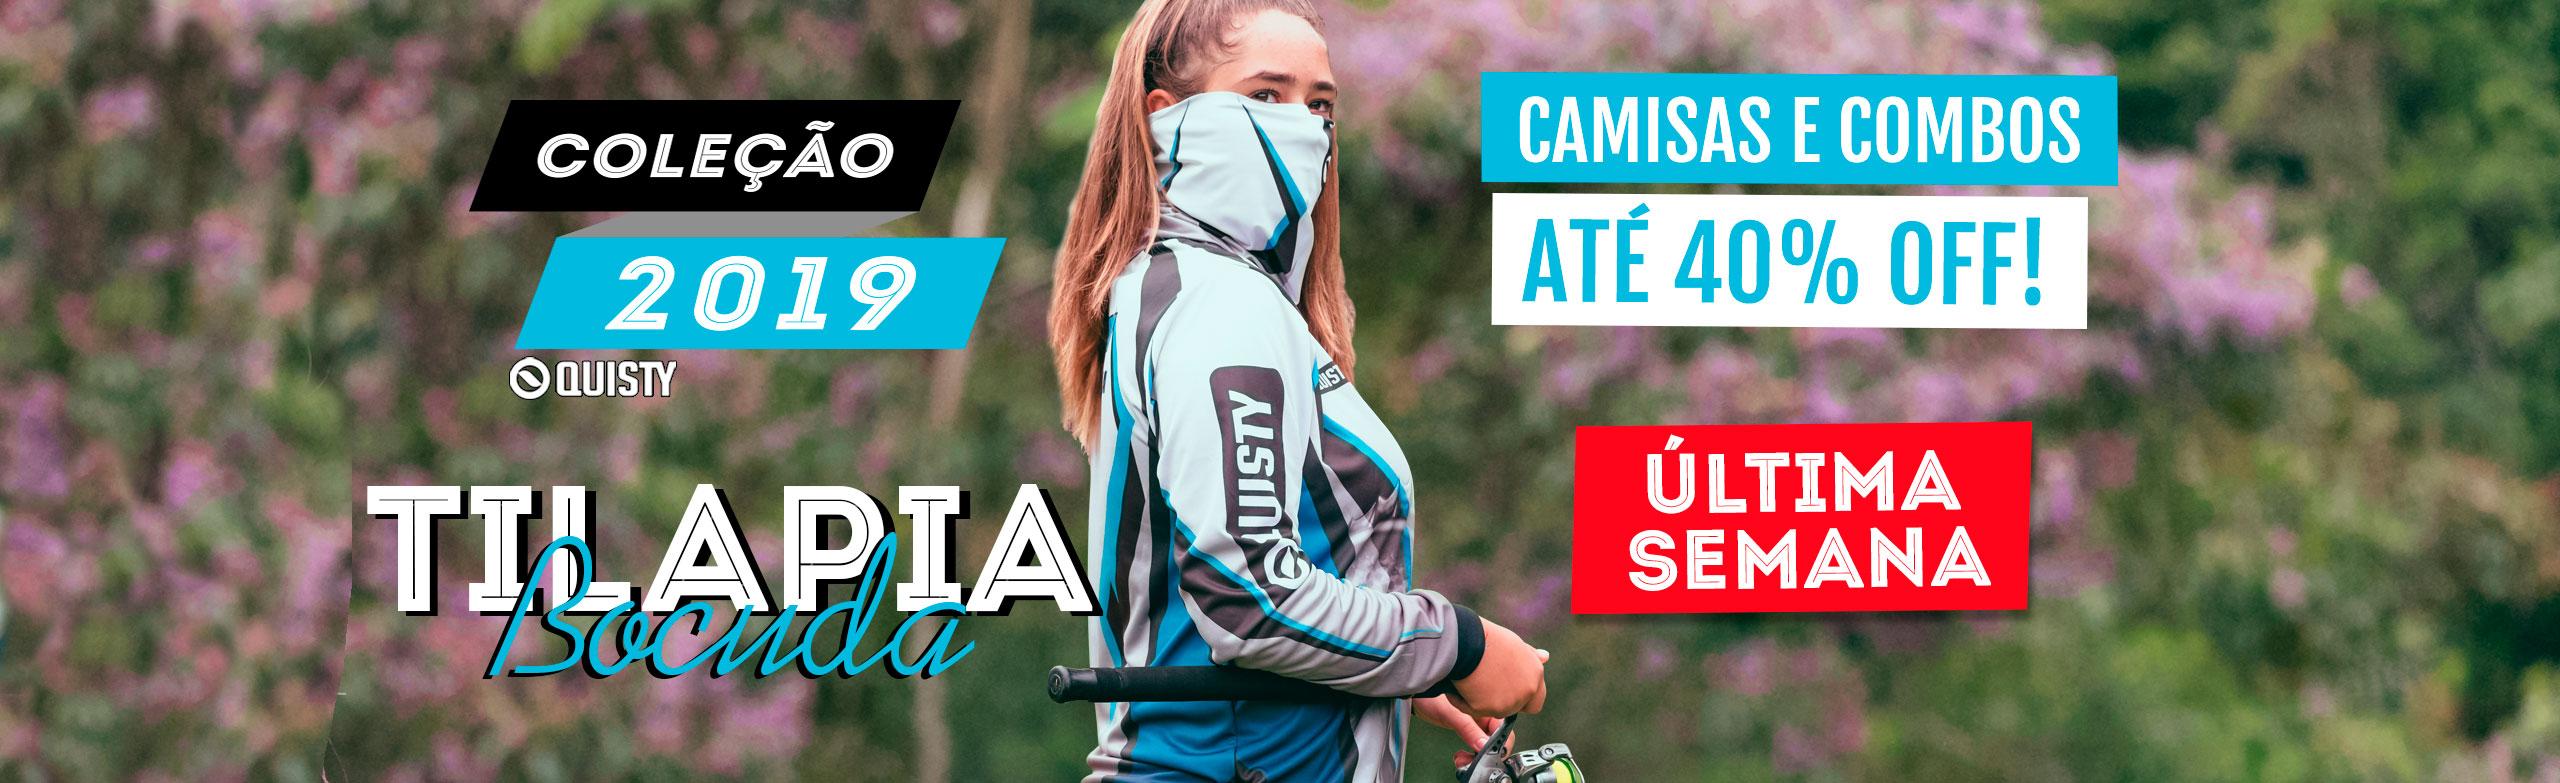 Tilápia Bocuda 2019